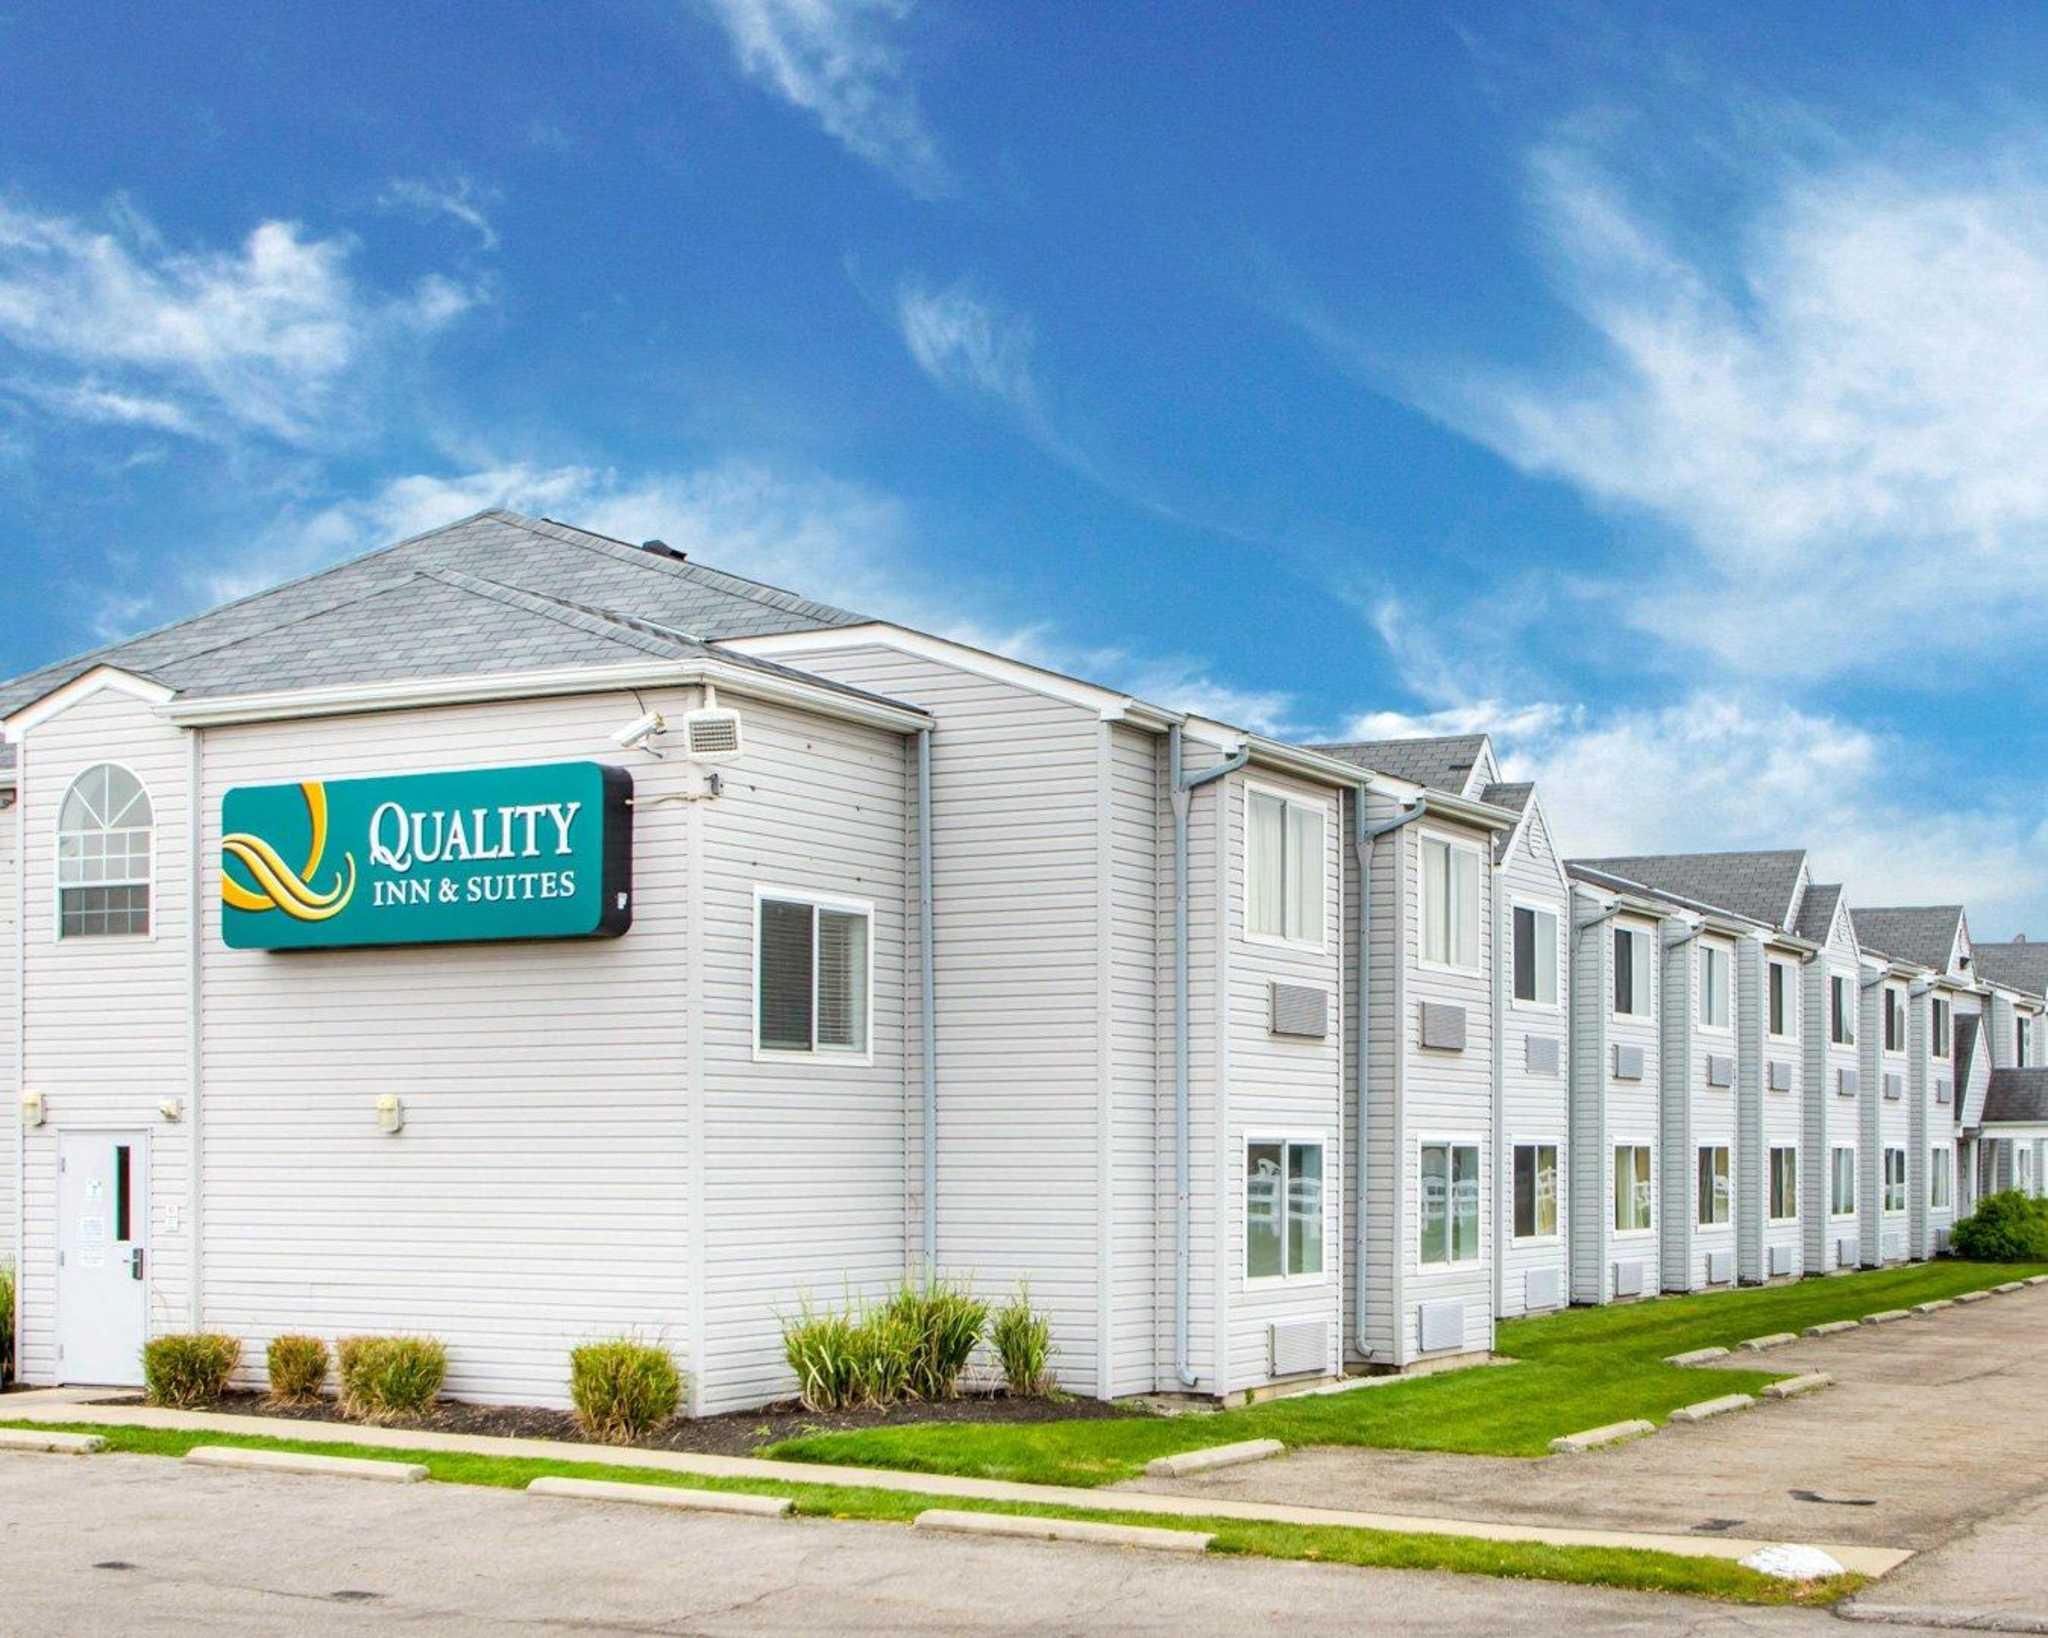 Drury Inn & Suites Columbus Convention Center - Drury Hotels